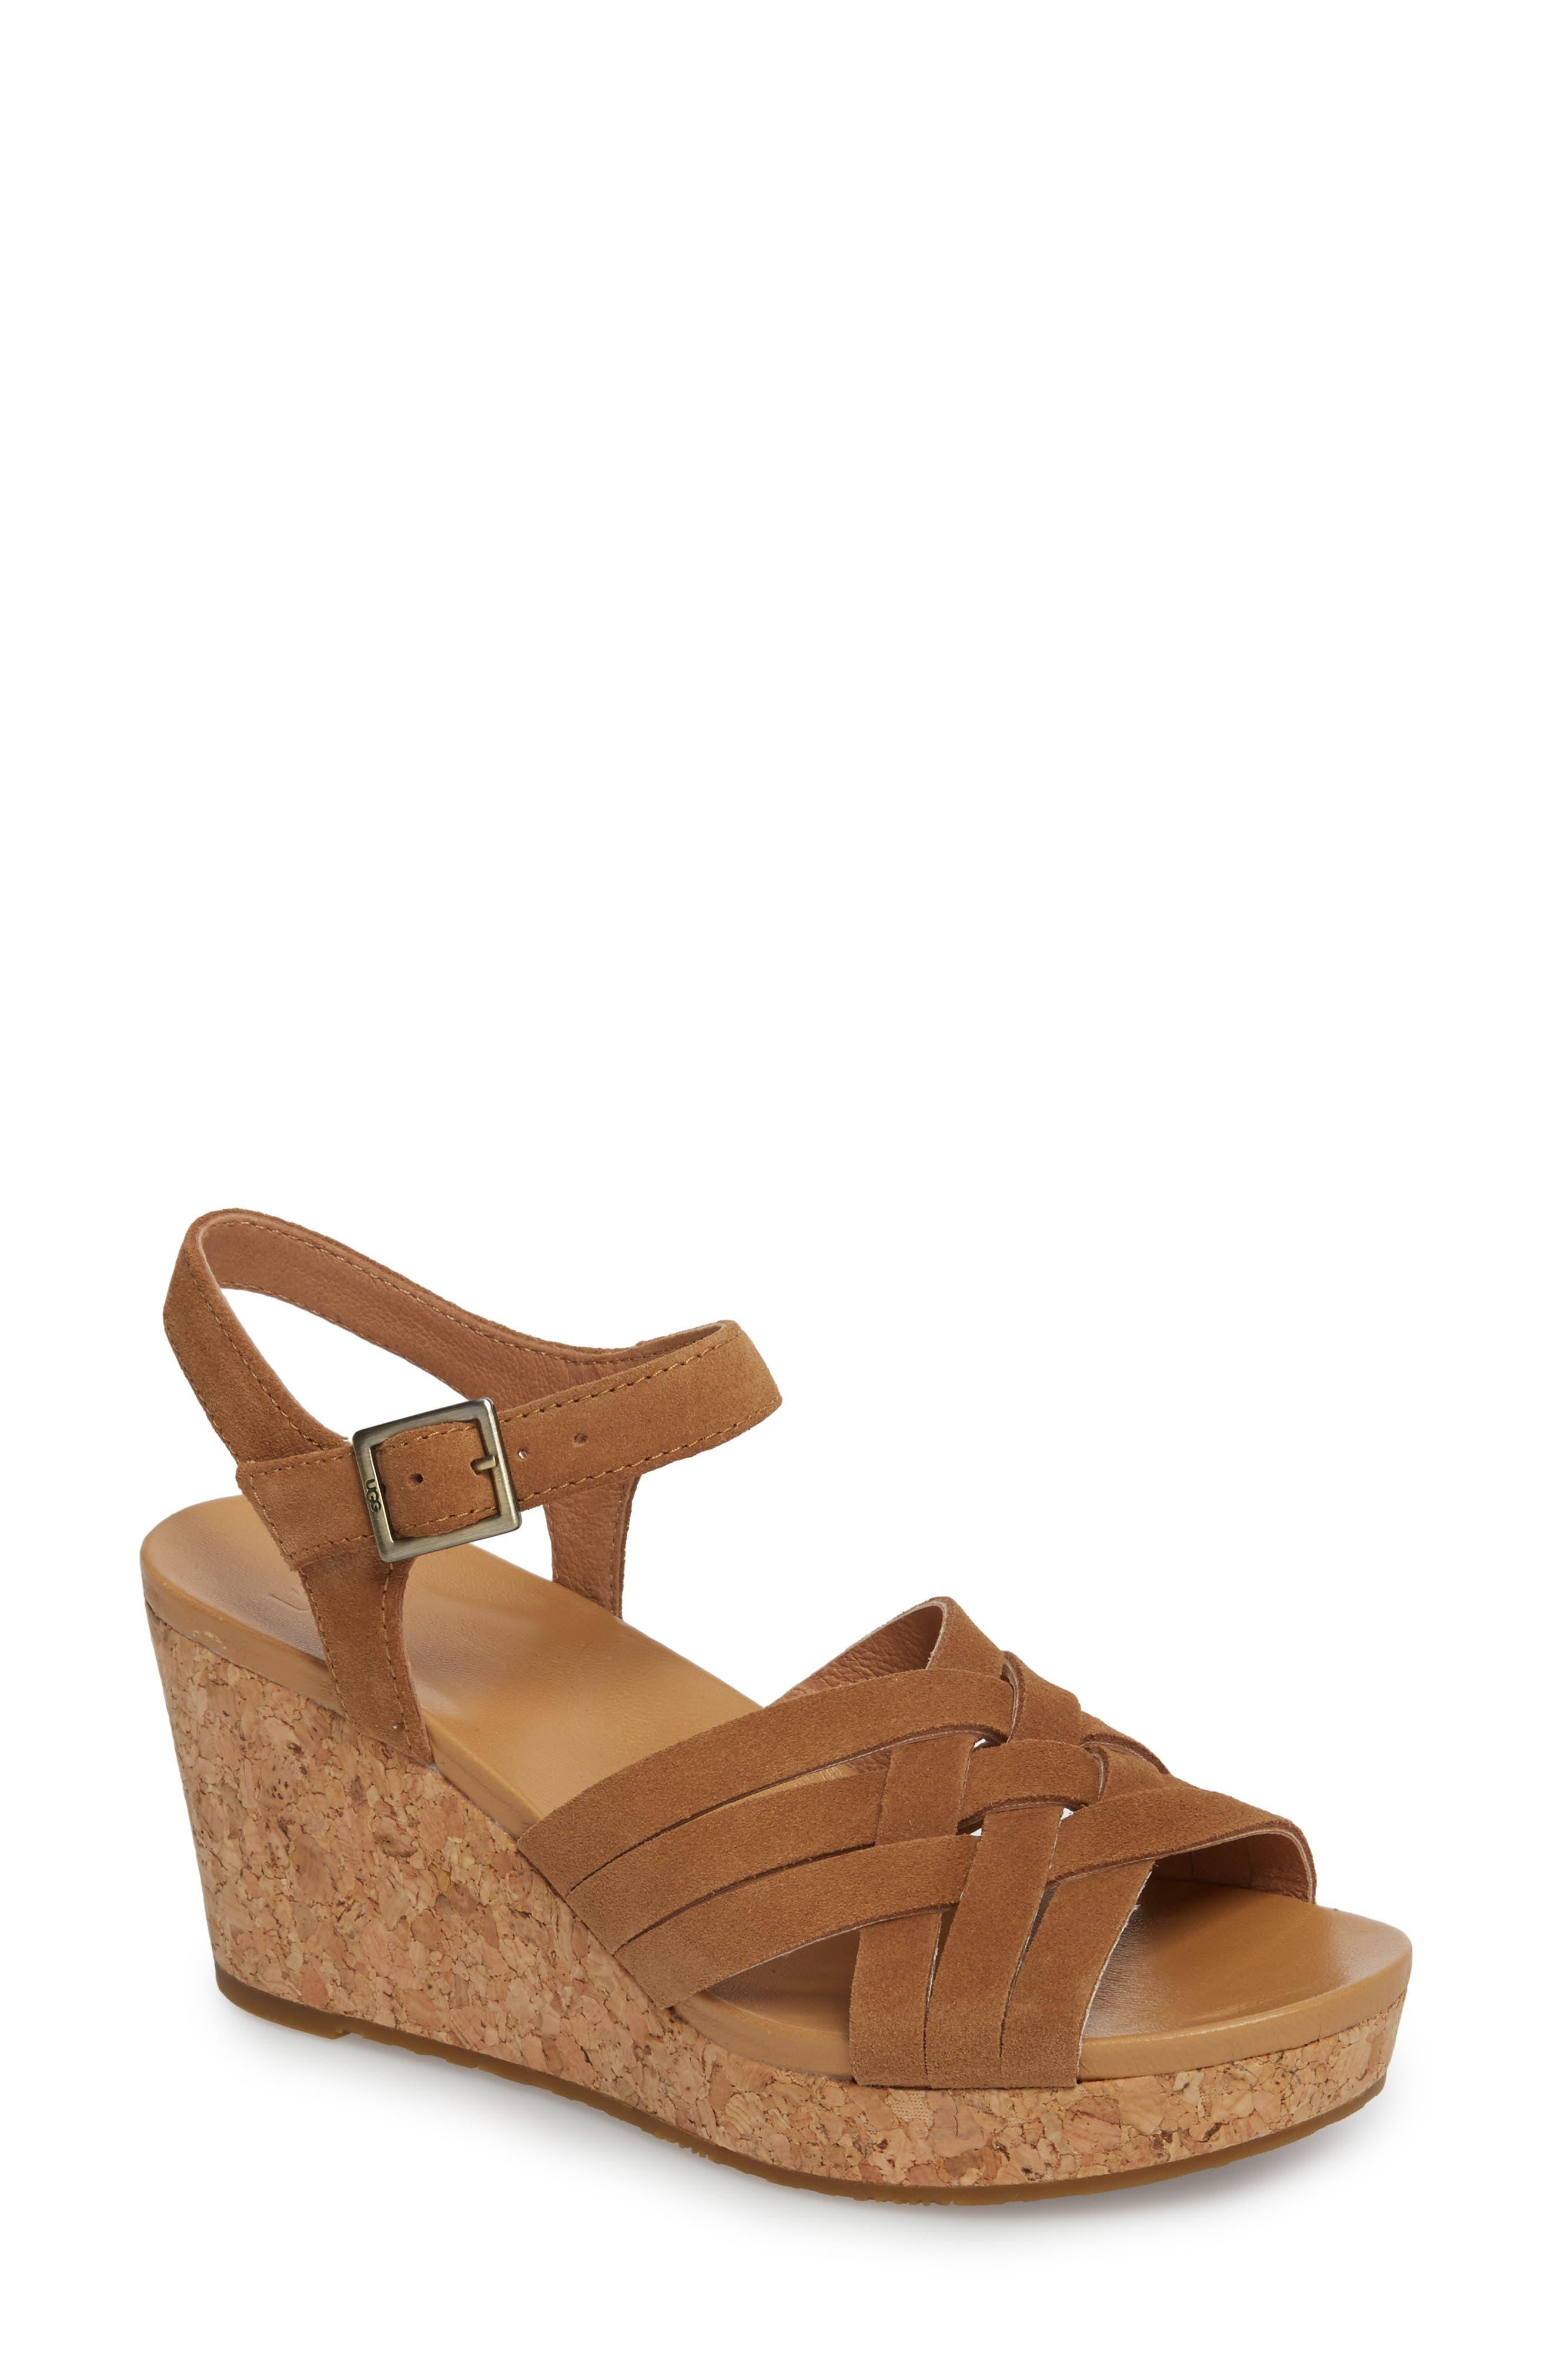 Uma Wedge Sandal,                         Main,                         color, Chestnut Suede